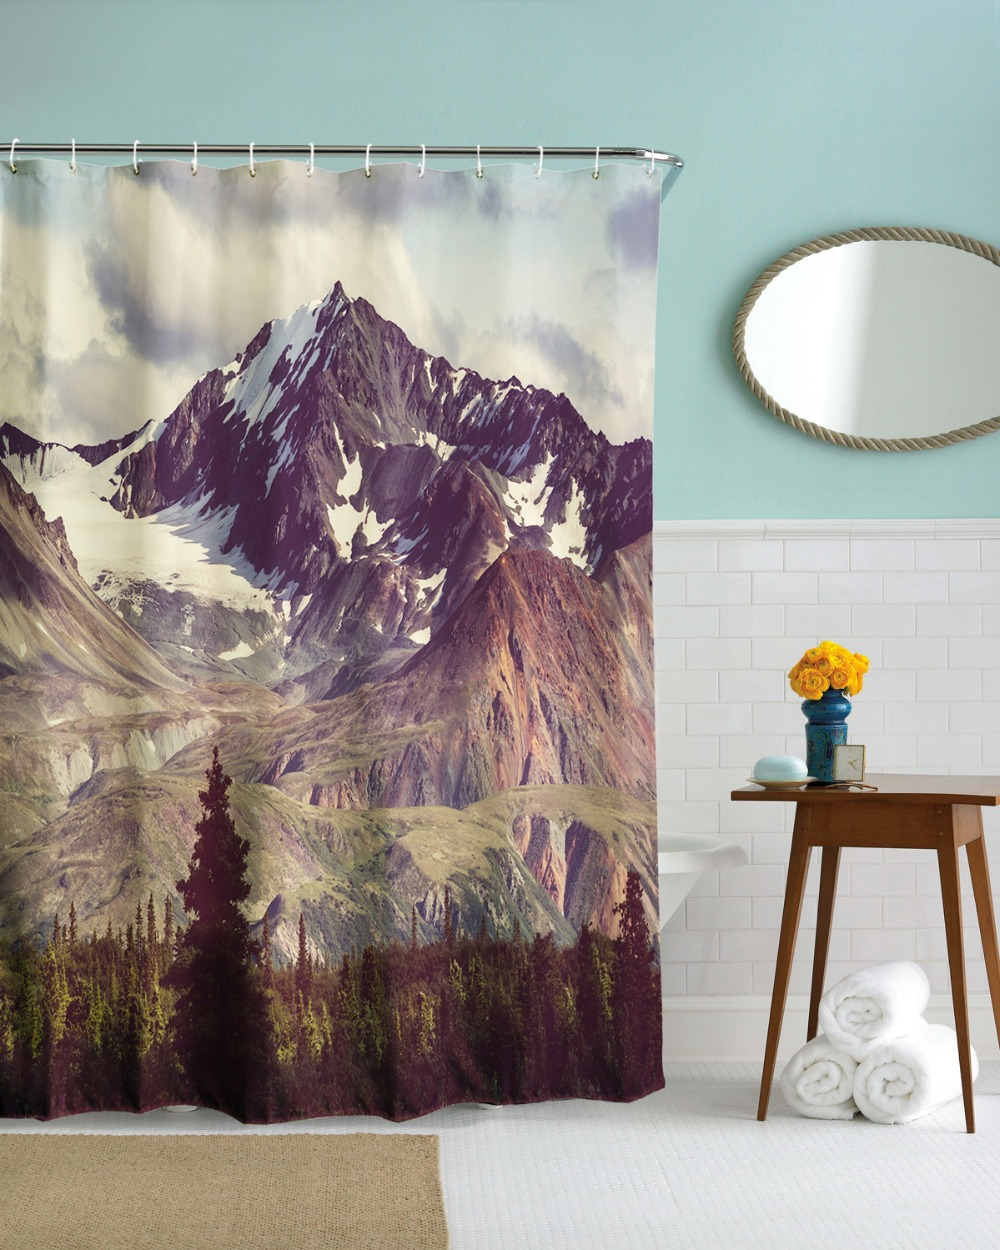 Fabric paris shower curtain - 3d Creative Alaska Iceberg Hill Shower Curtain Waterproof Fabric Polyester Bathroom Curtain Bath Curtain Cortinas American Style